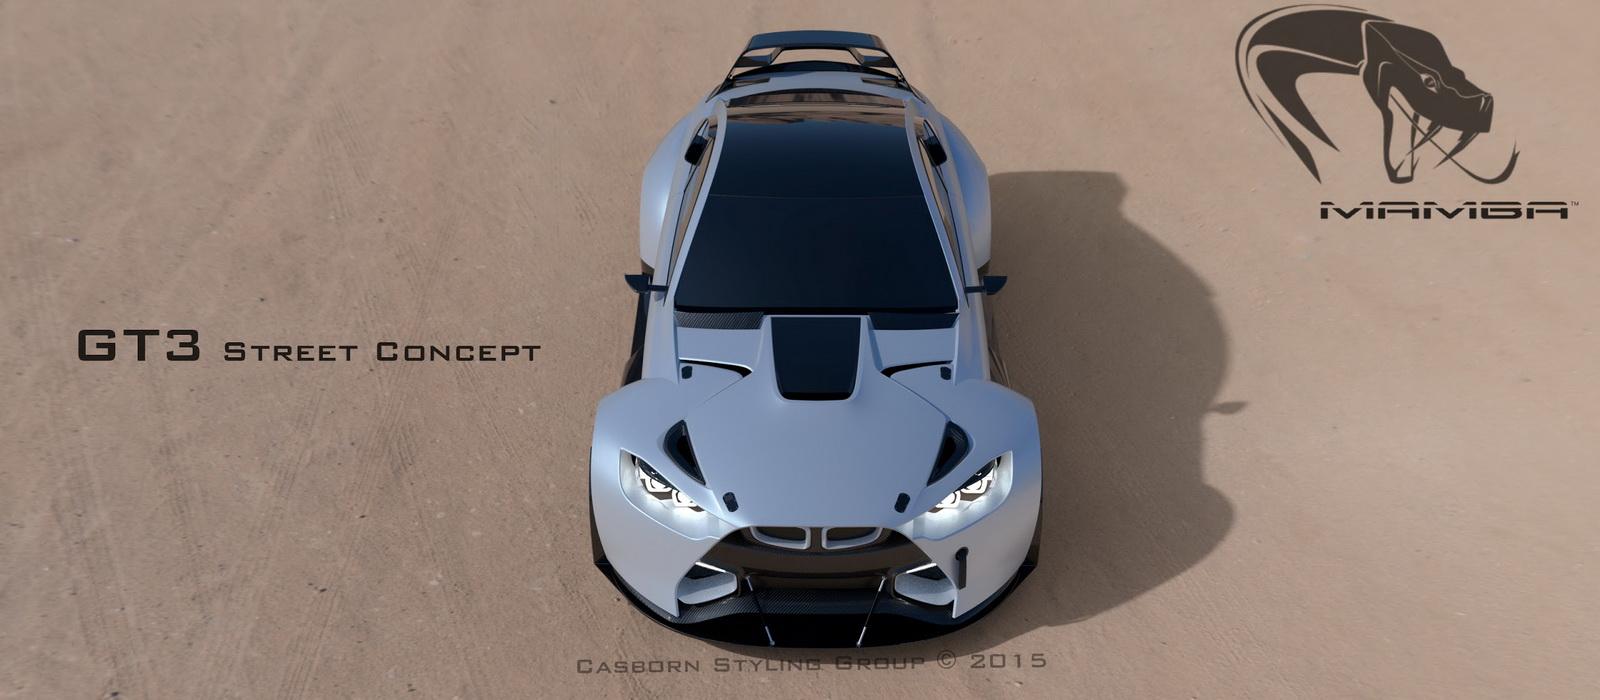 BMW Mamba koncepti i mahnitshem i makines hunde peshkaqen foto 2